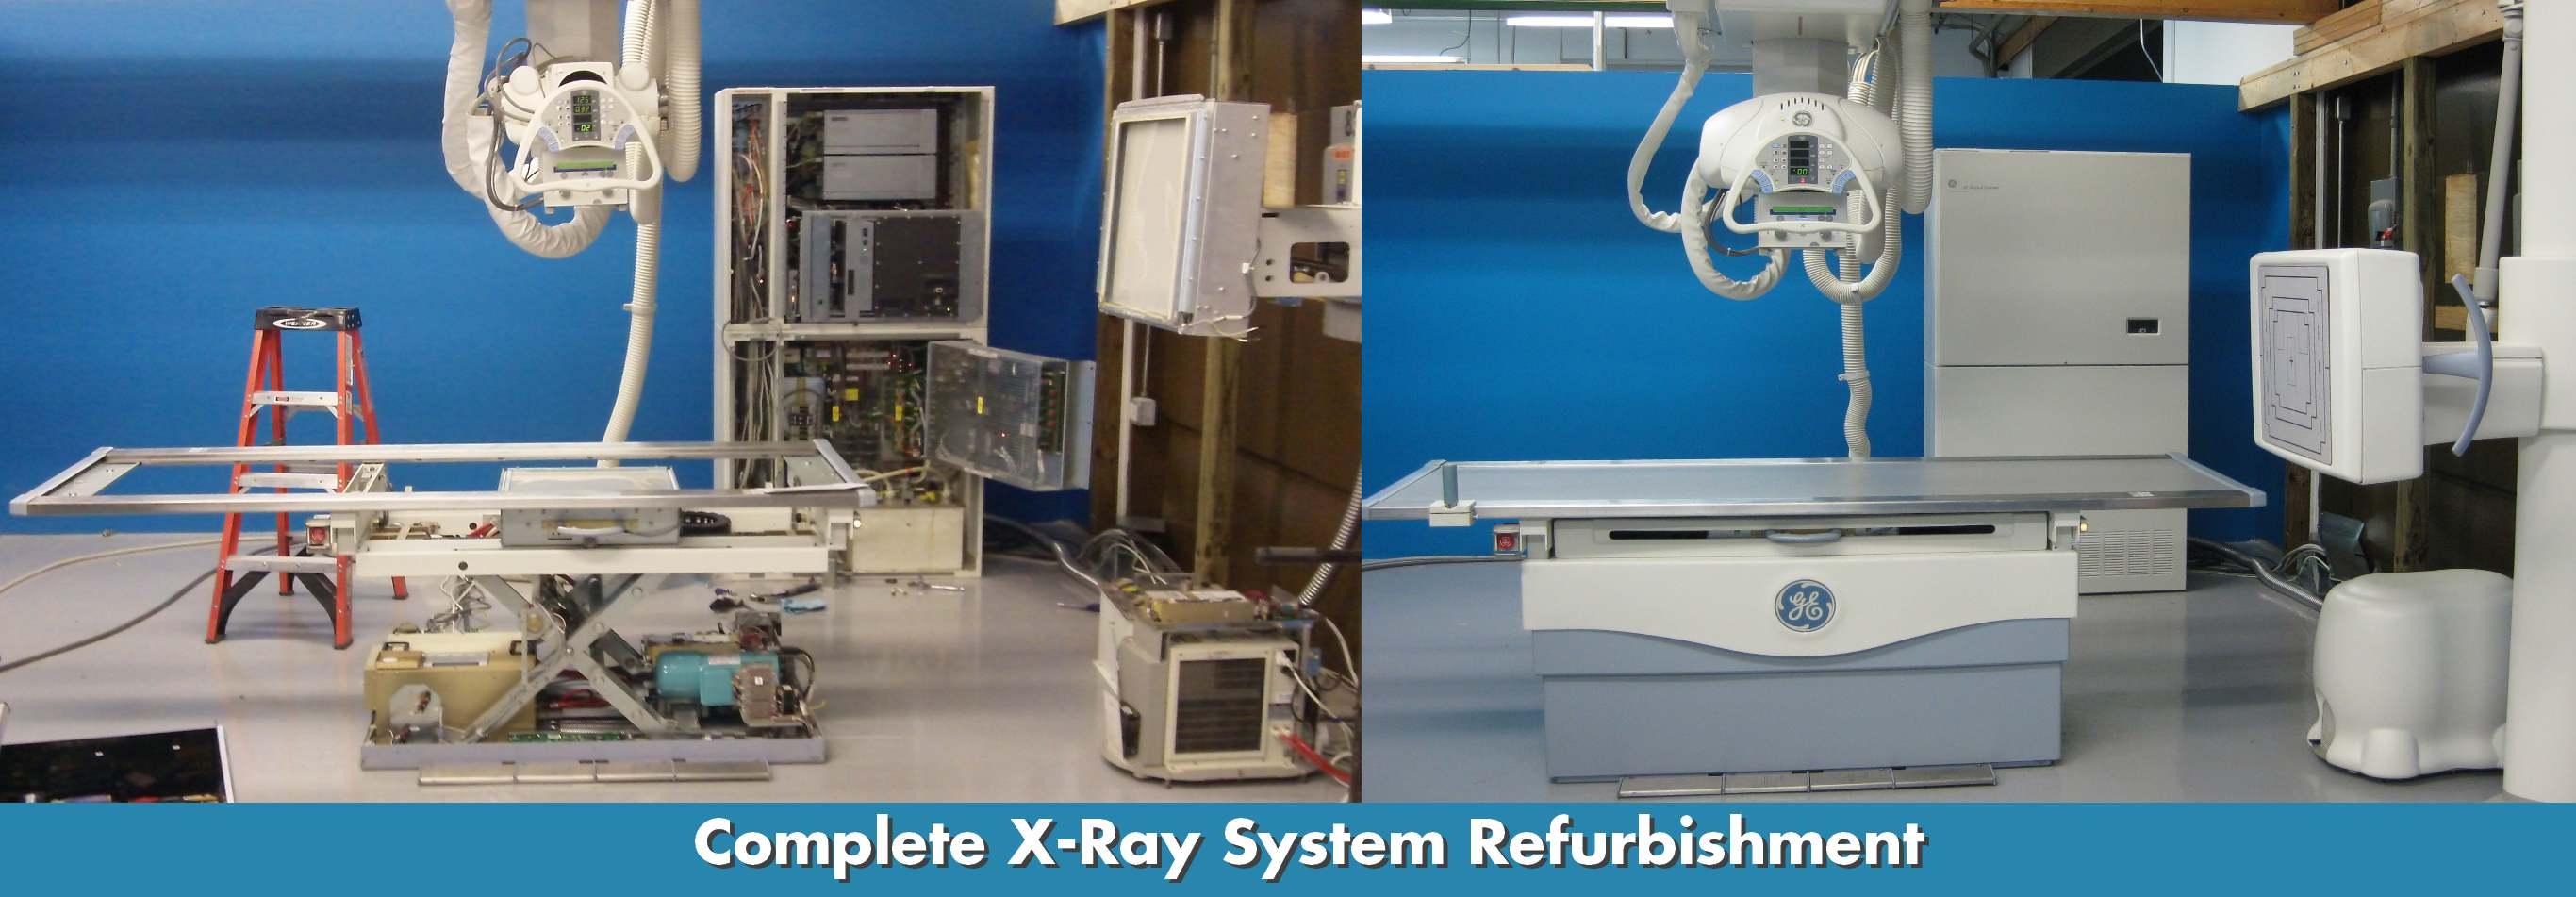 X Ray Refurbishment Banner